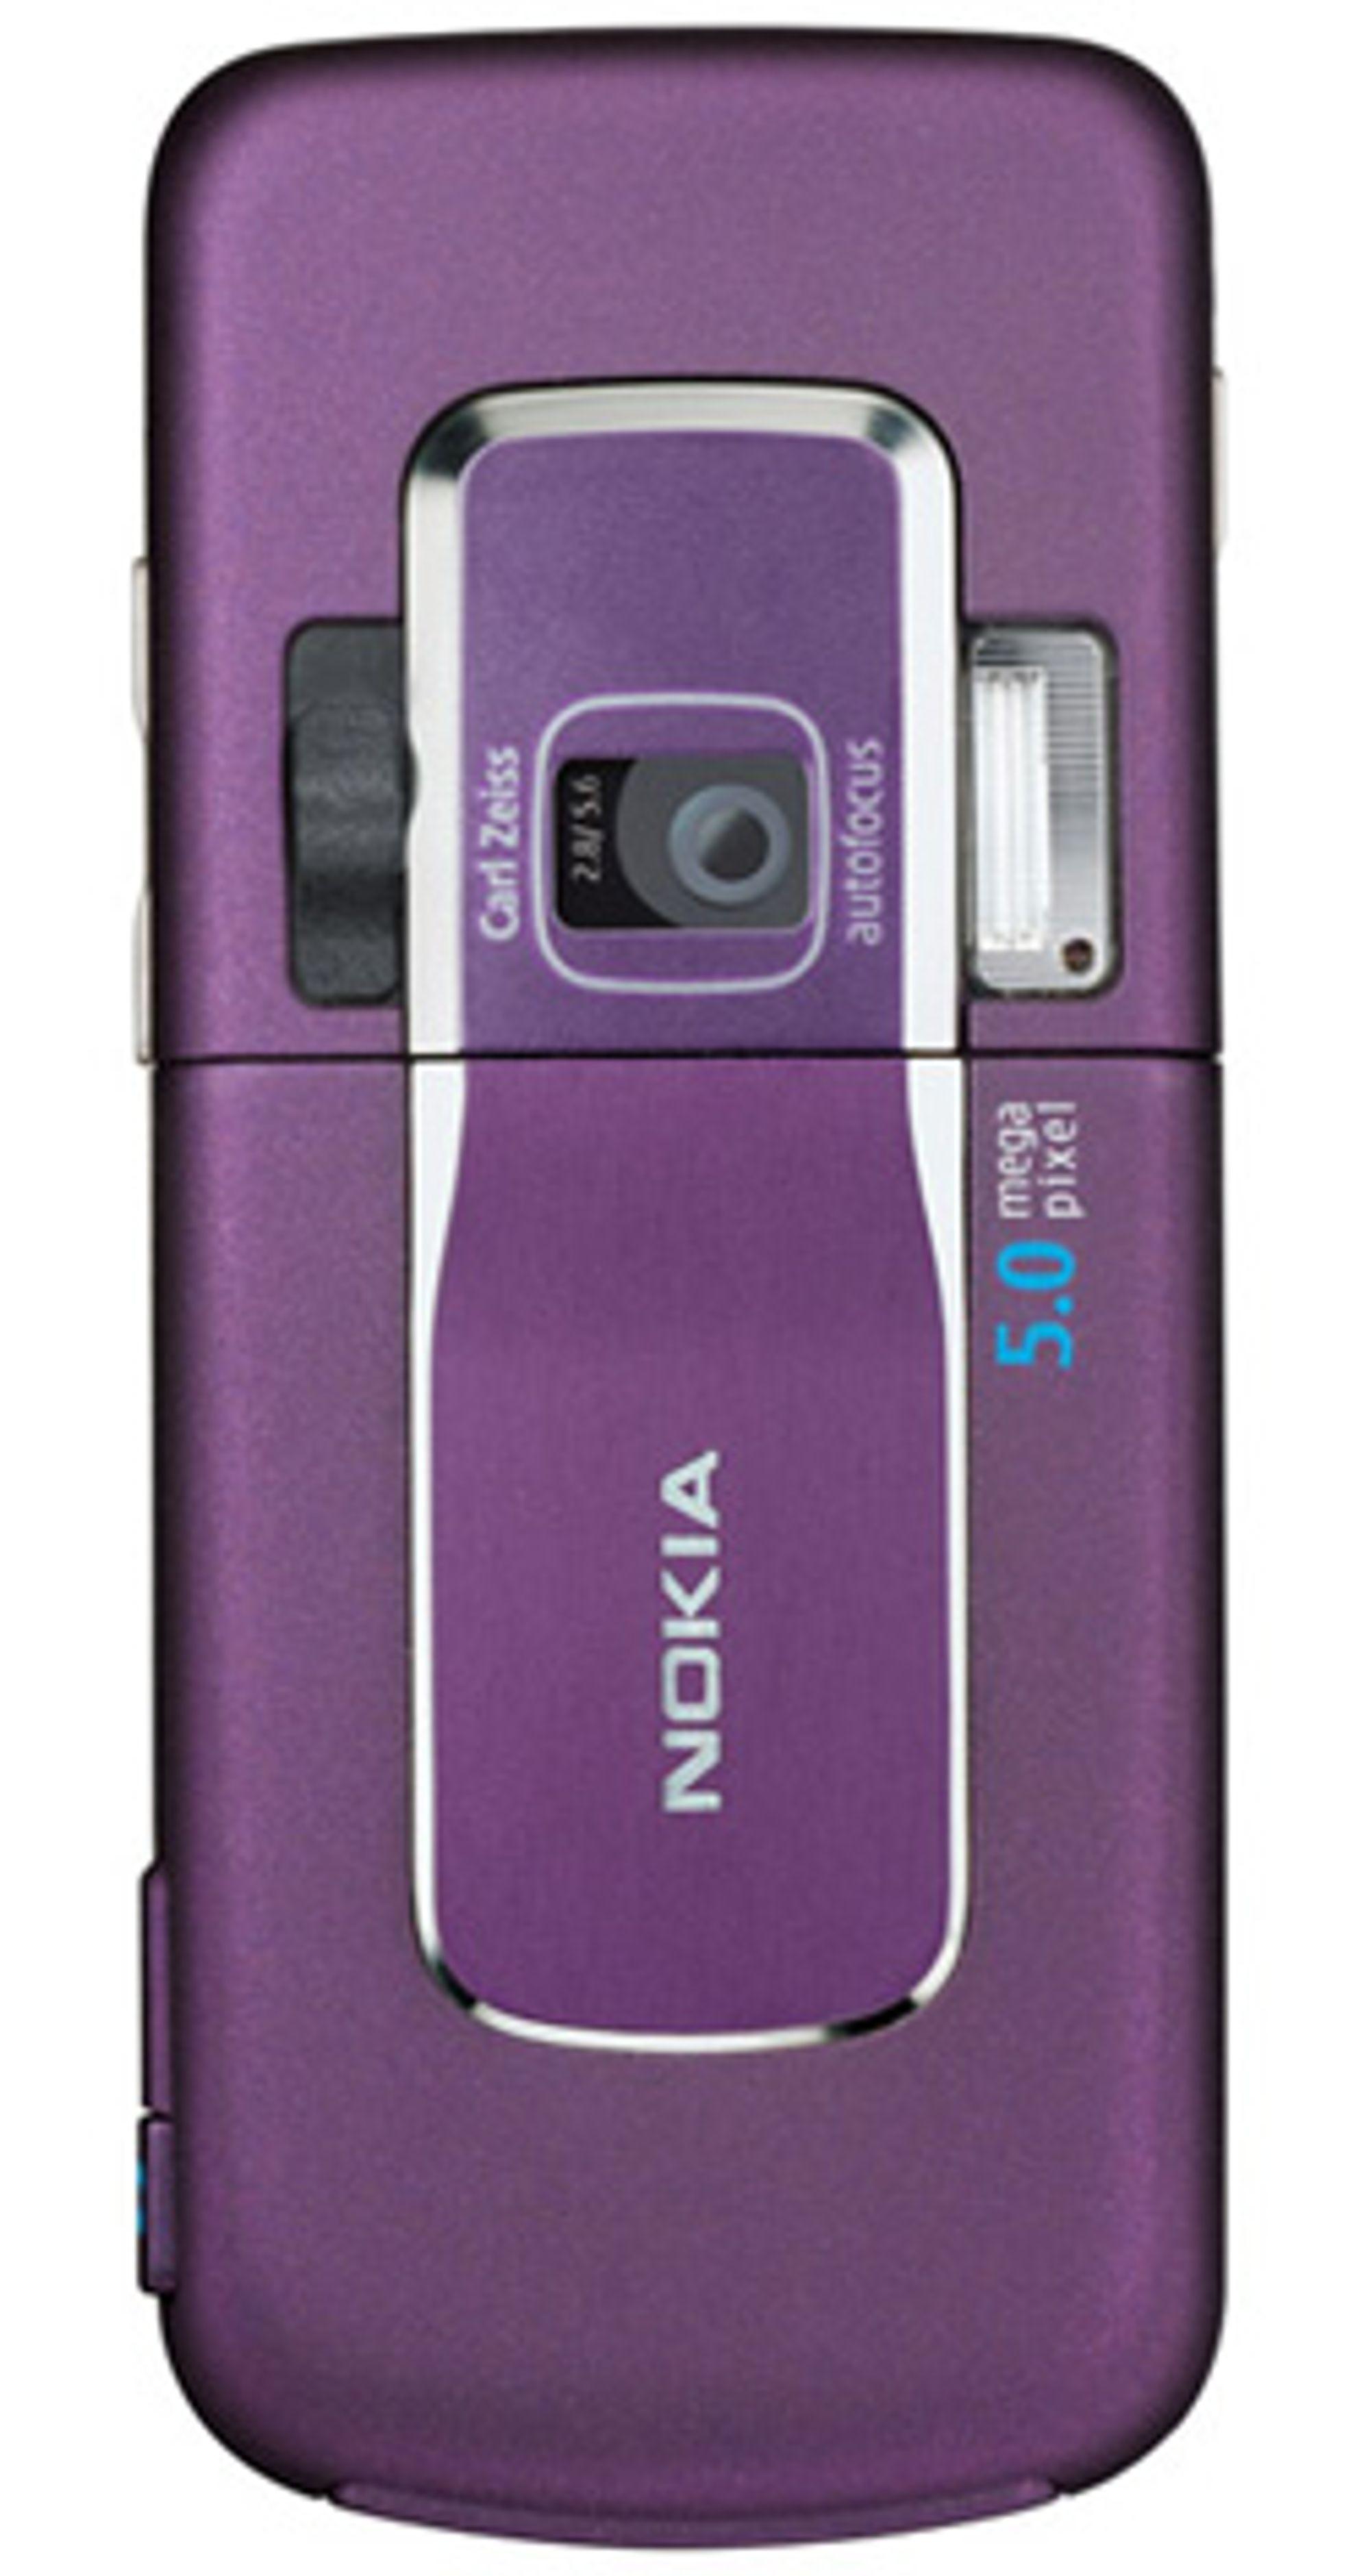 Baksiden av Nokias 6200 Classic. (Foto: Nokia)